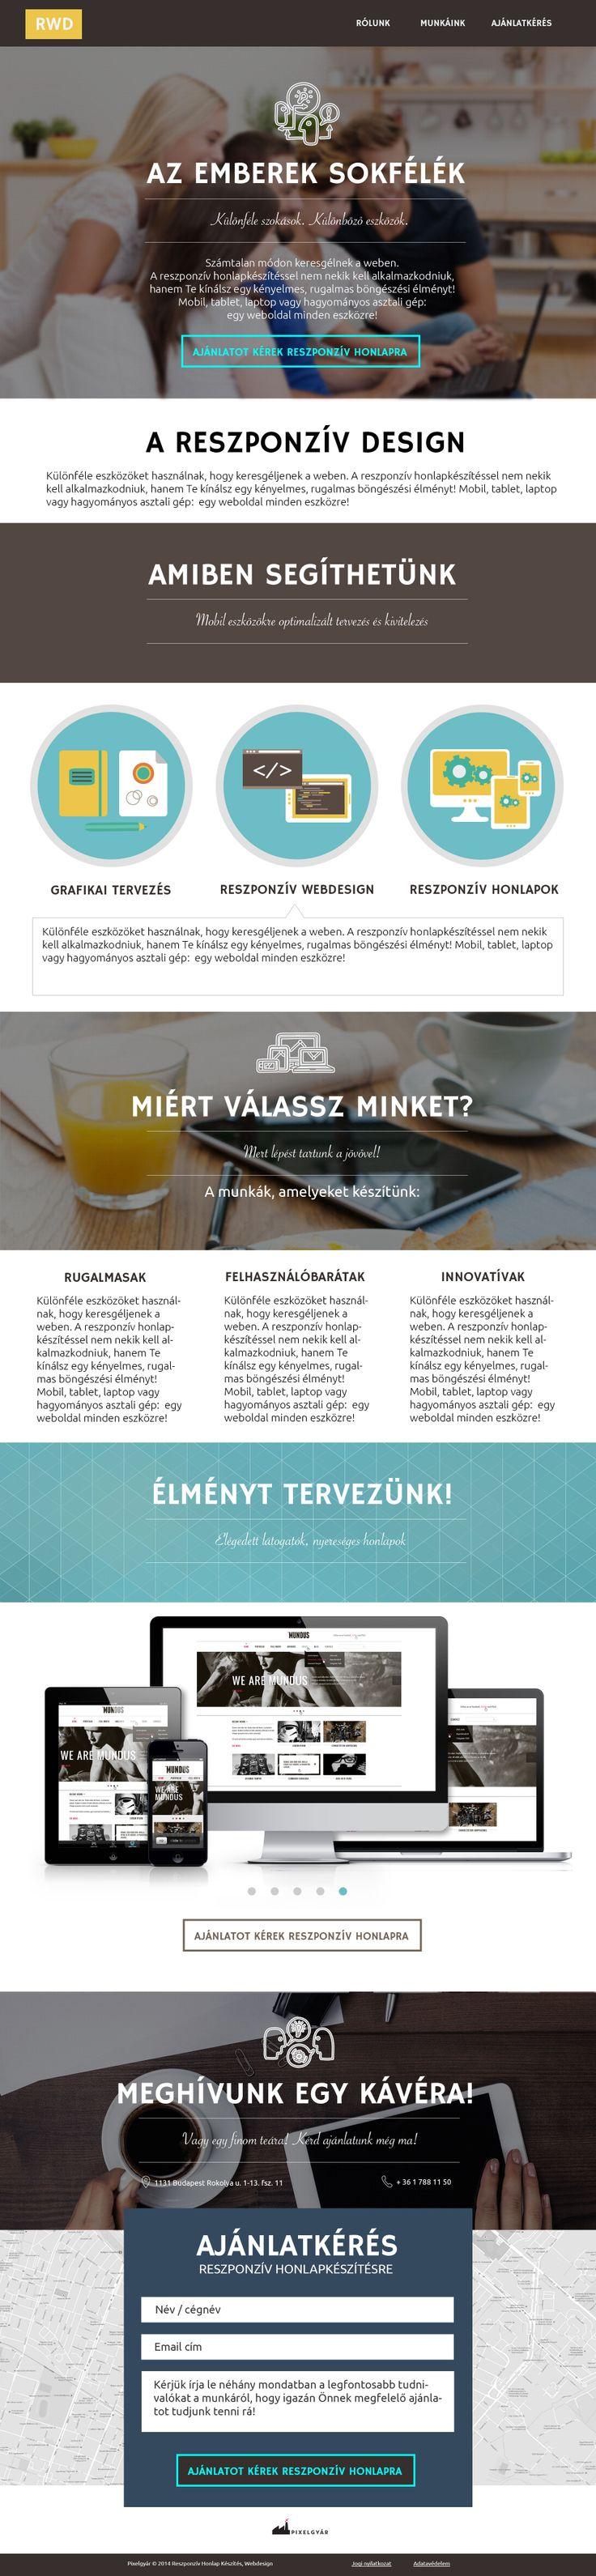 Responsive.hu Reszponzív webdesign, mobilra optimalizált honlapok - http://responsive.hu